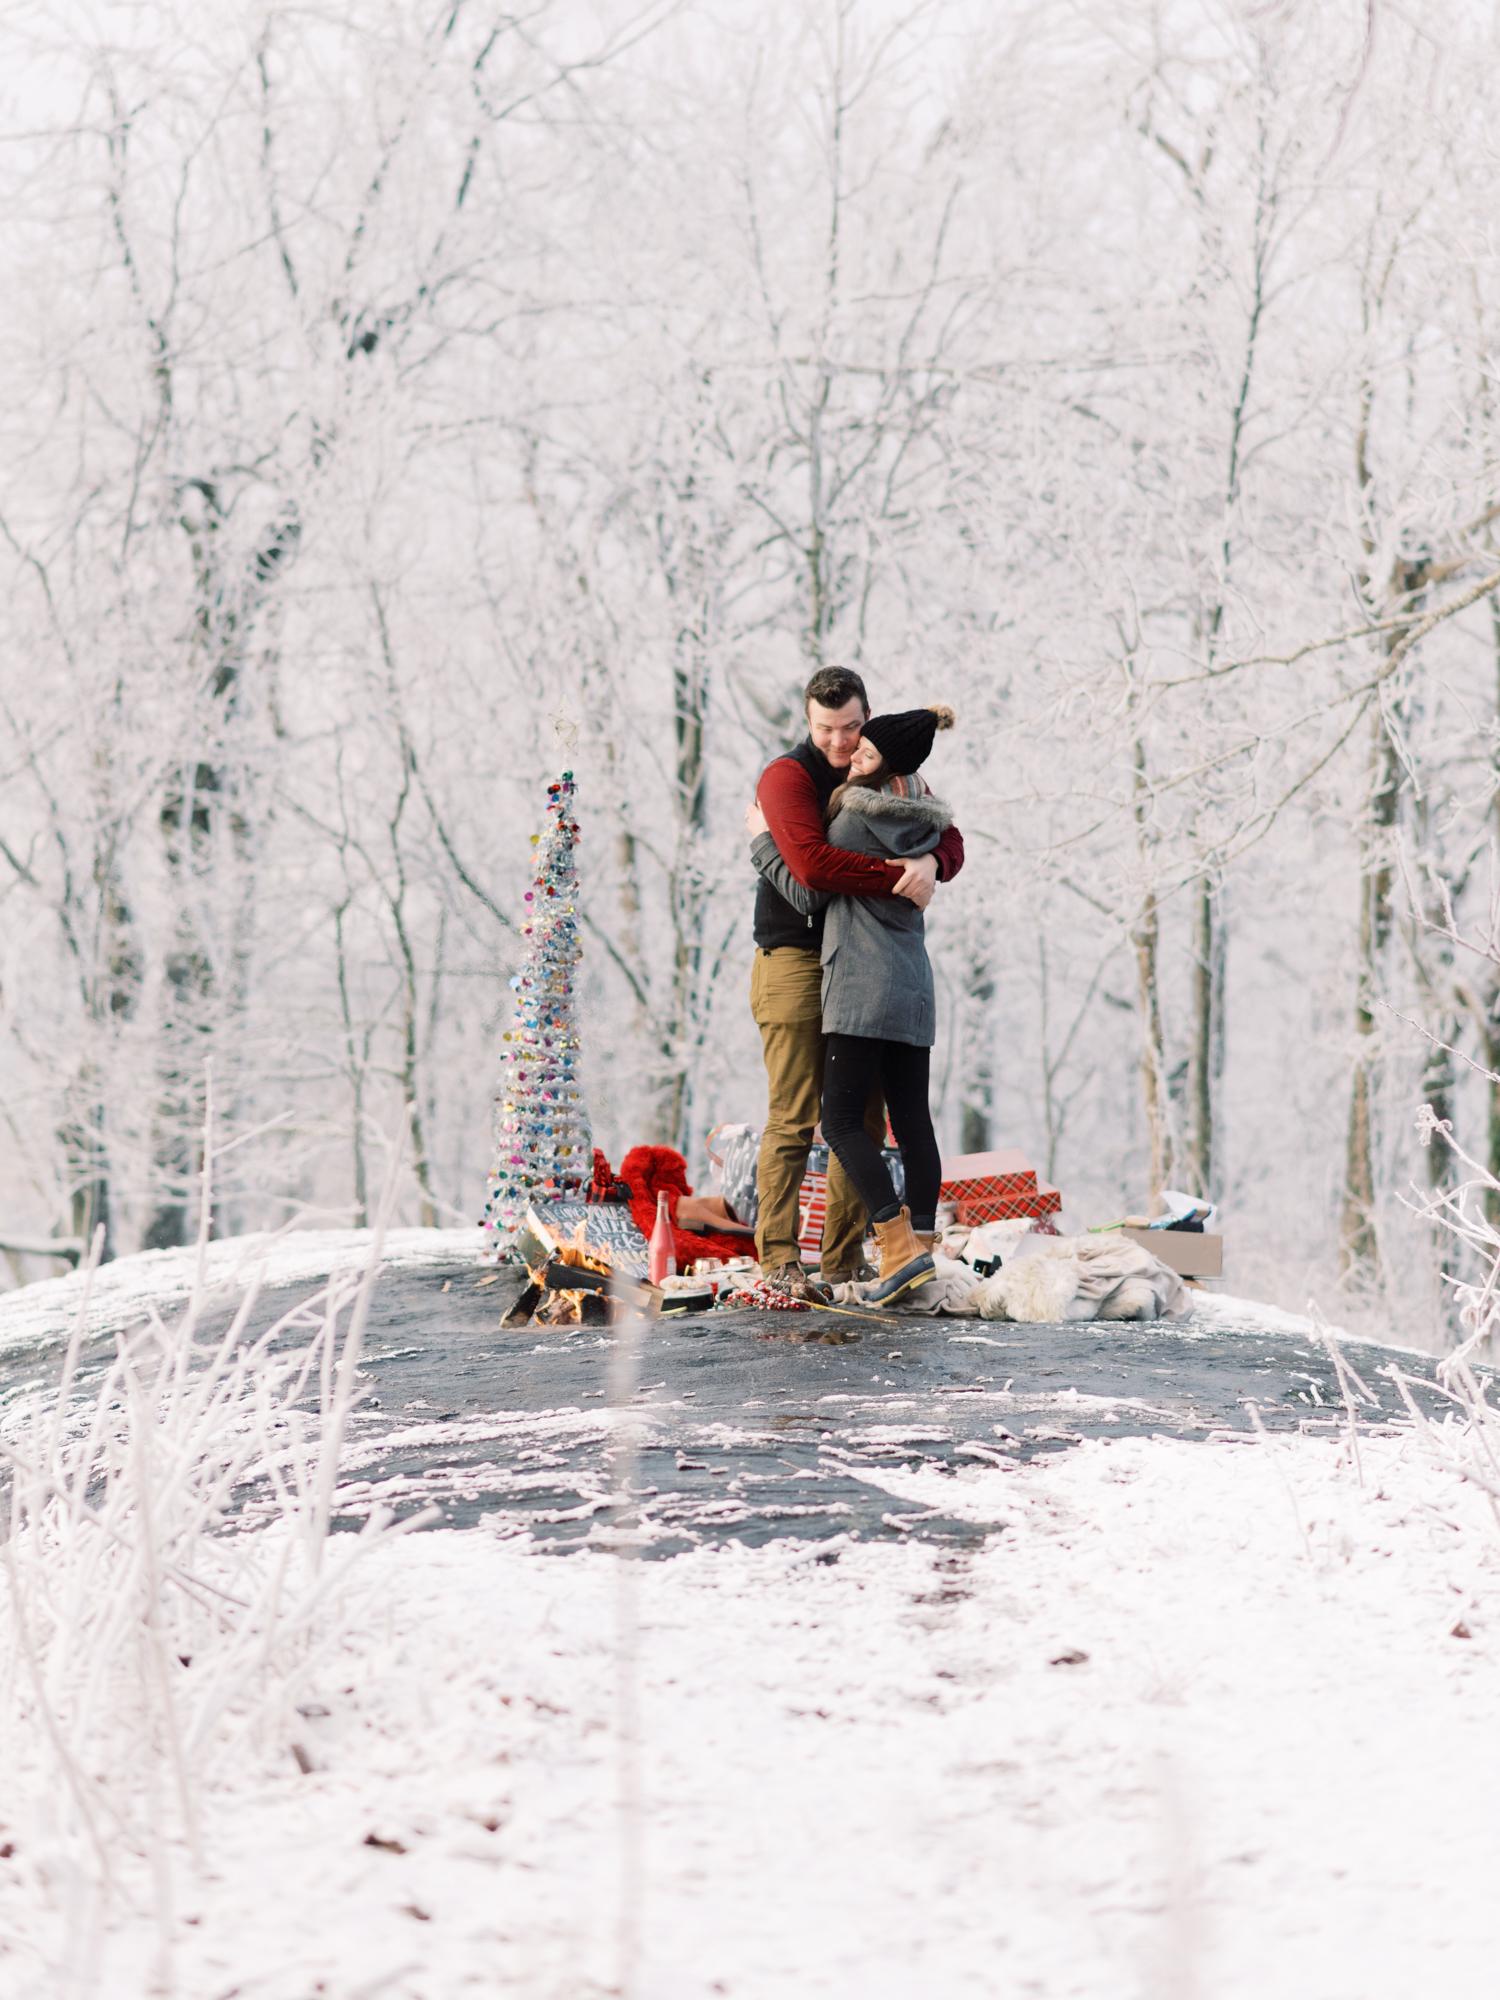 snowy-georgia-proposal-preachers-rock-atlanta-dahlonega-wedding-photographer-hannah-forsberg-fine-art-film-14.jpg